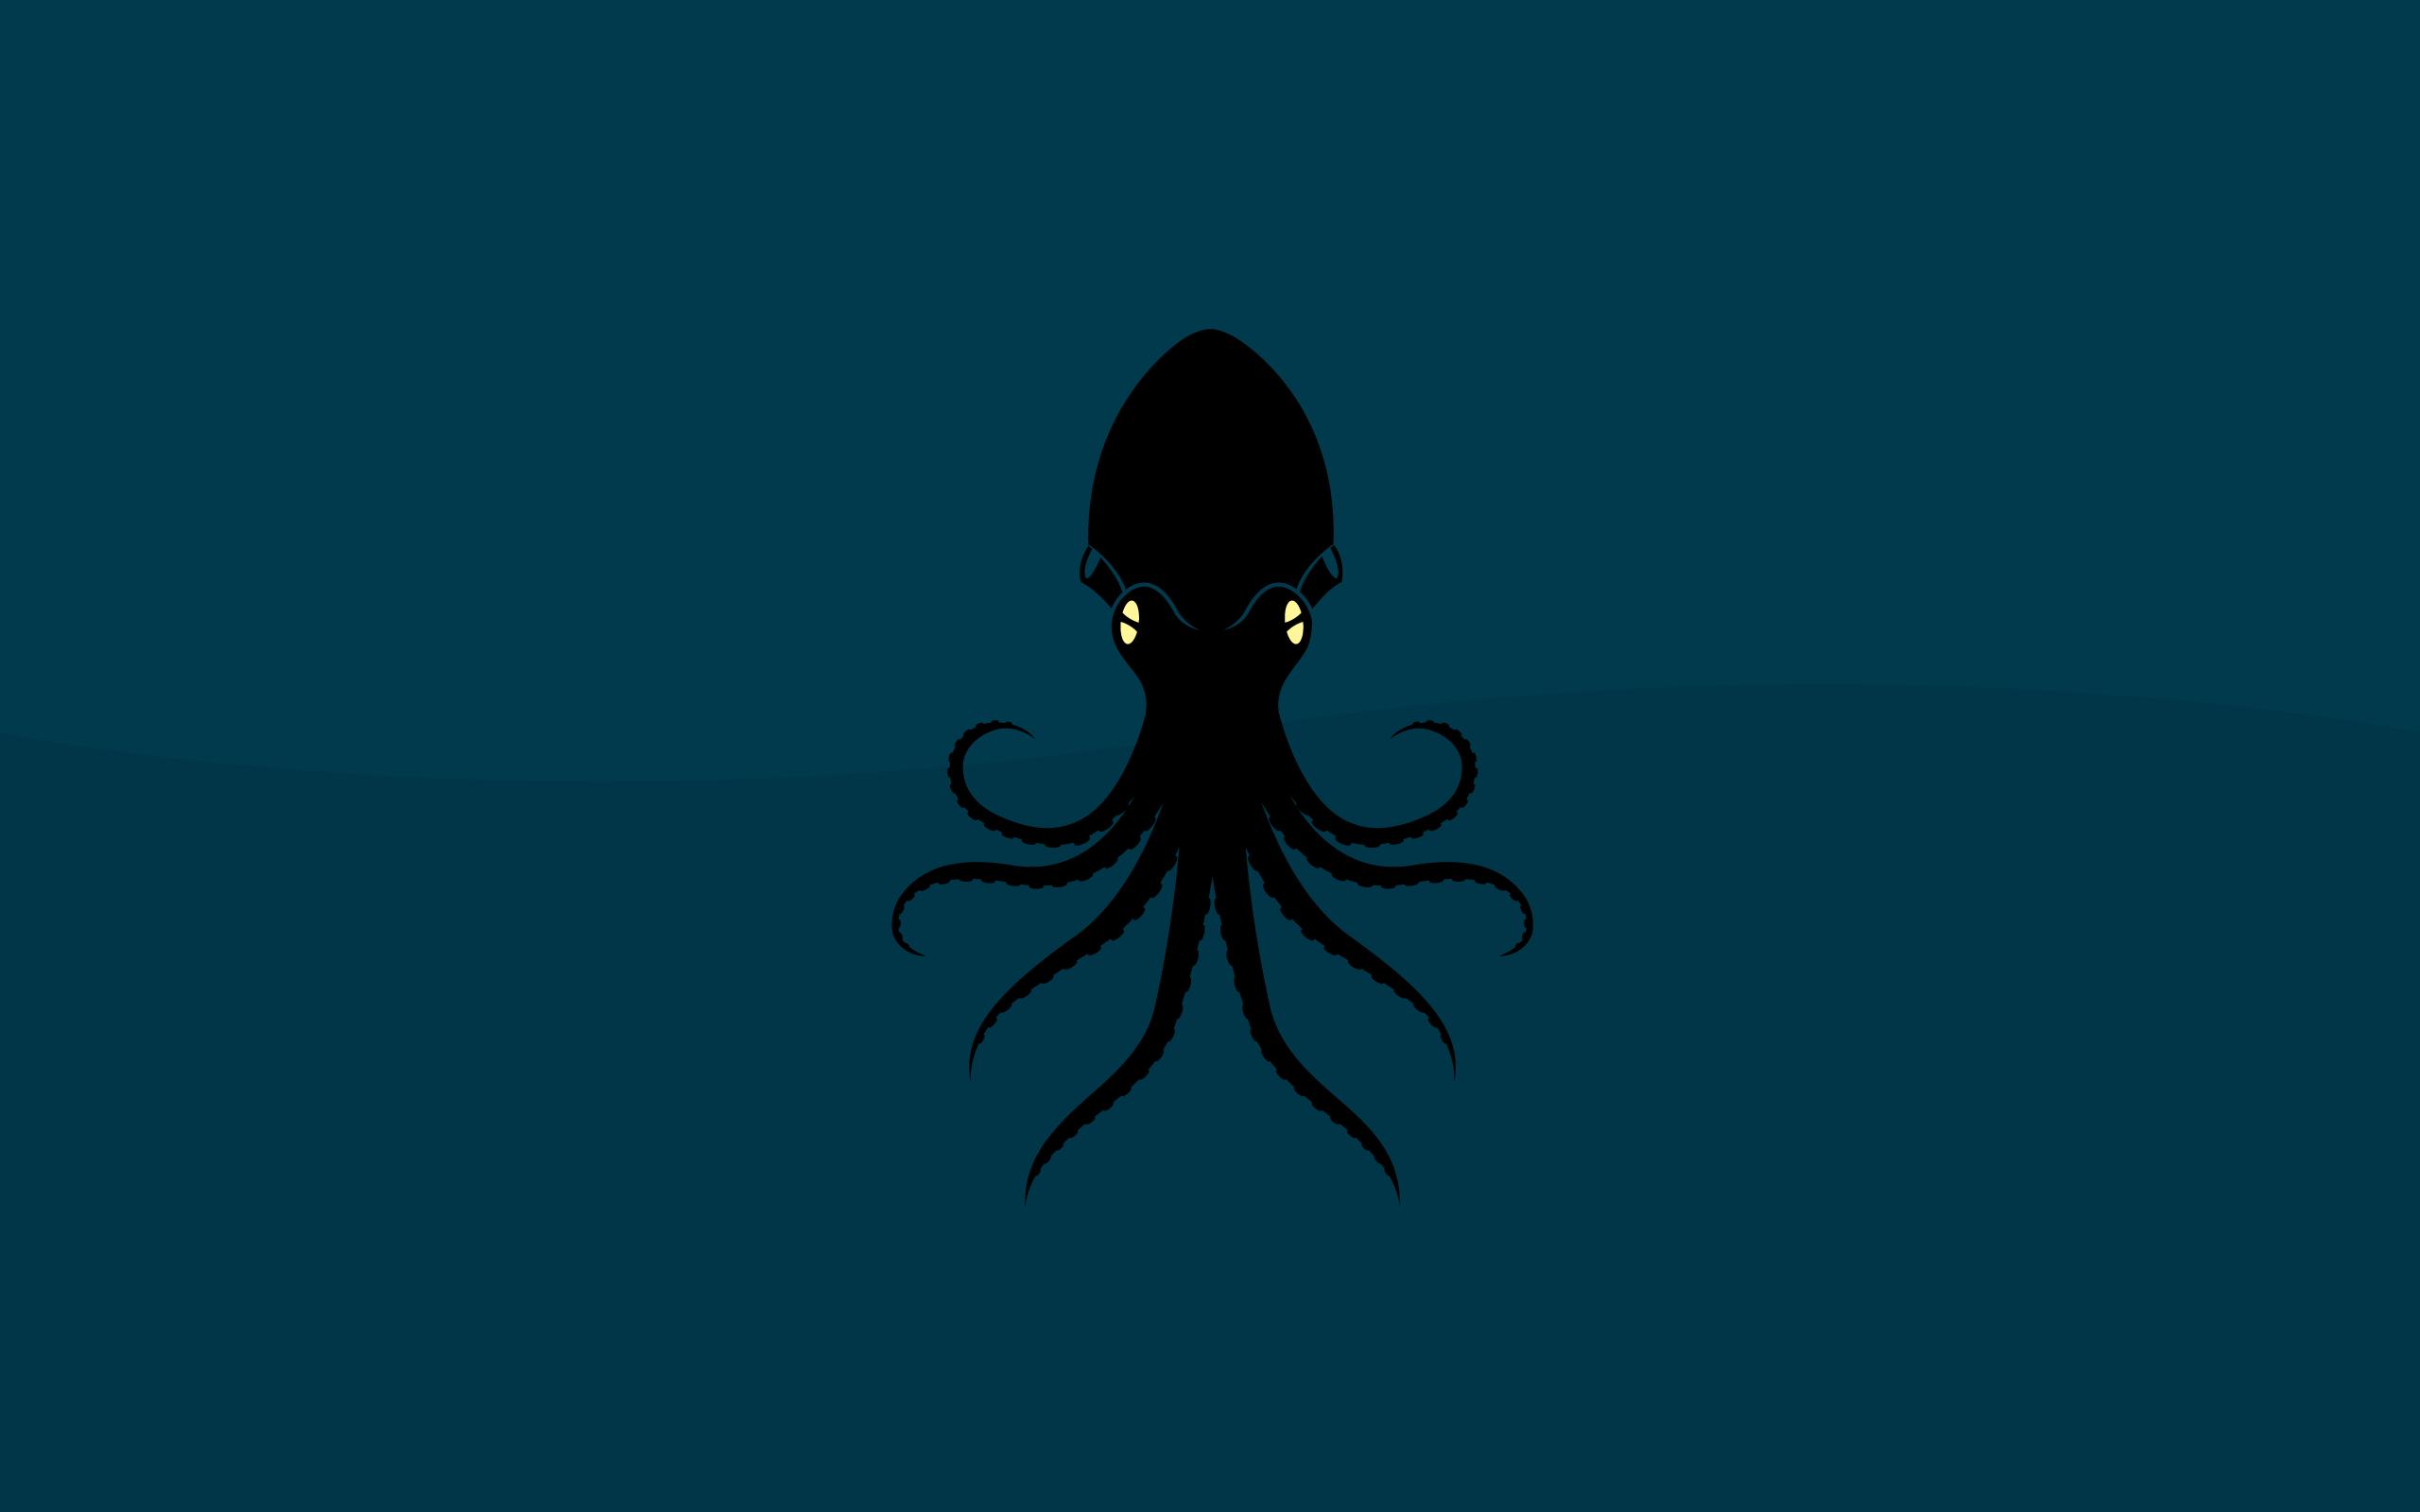 wallpapers/octopus.png